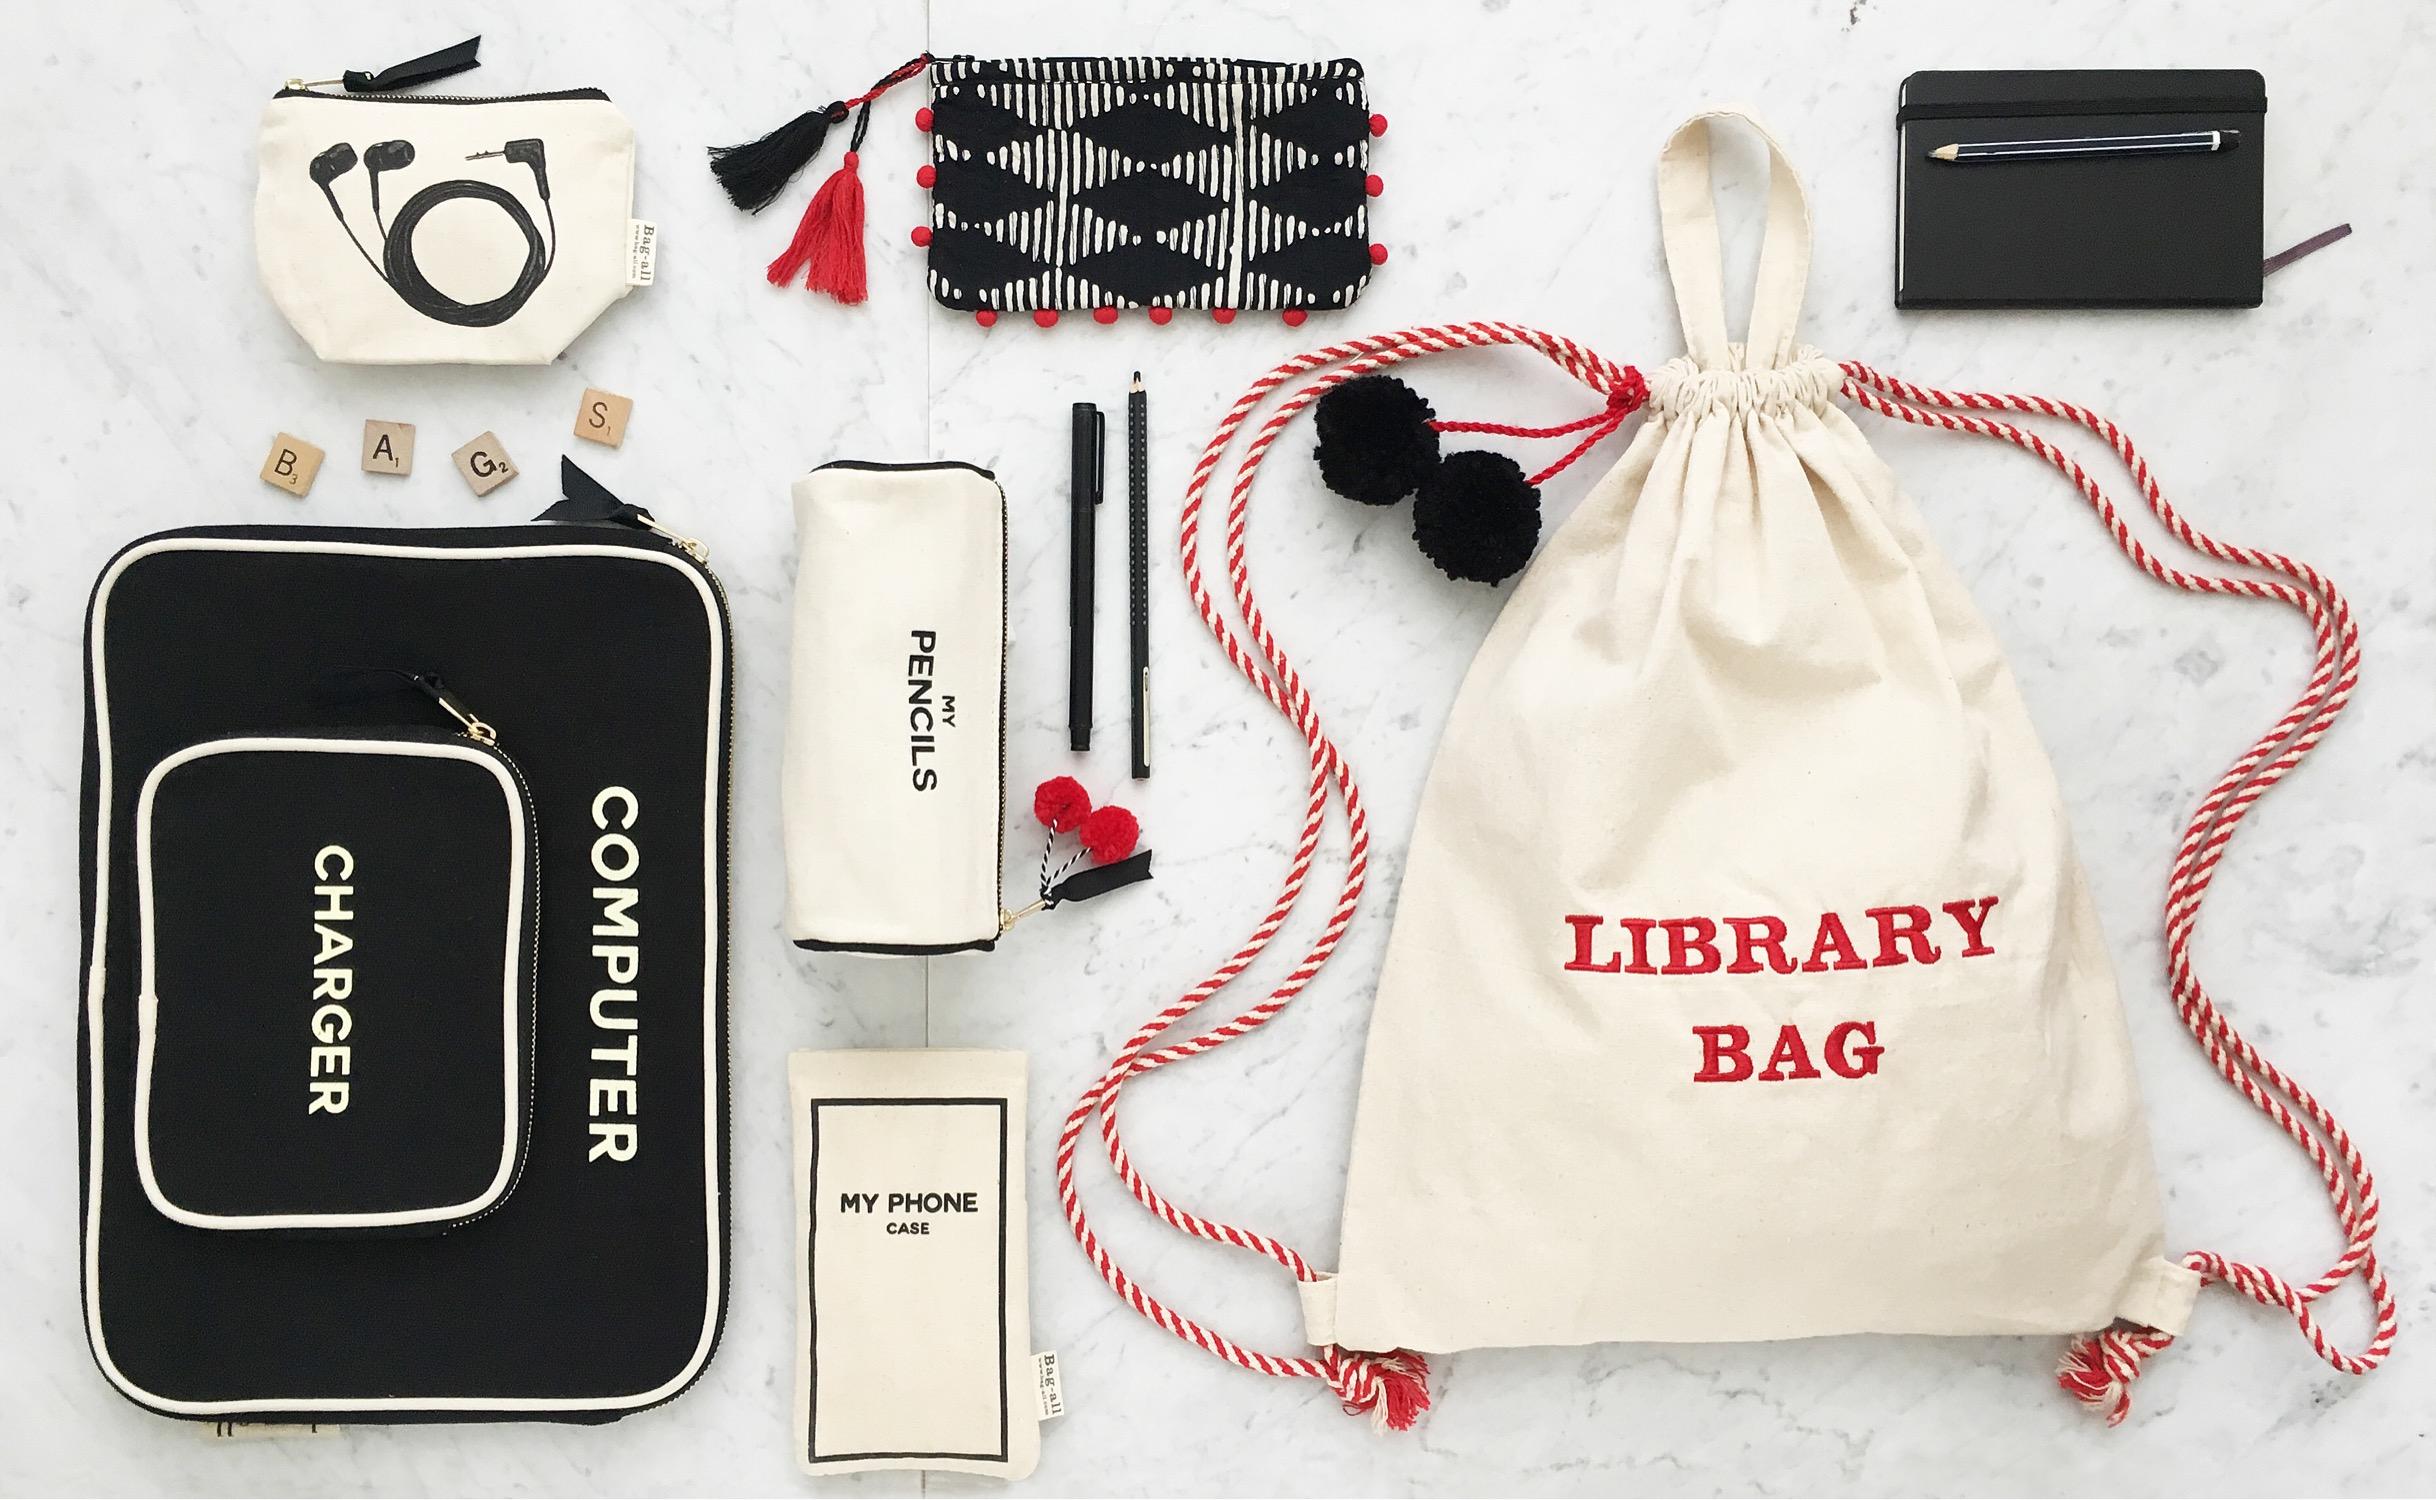 Blank Drawstring Backpack, black computer case, eatbuds case, pom pom shade, pencil, phone case mood bag-all.JPG